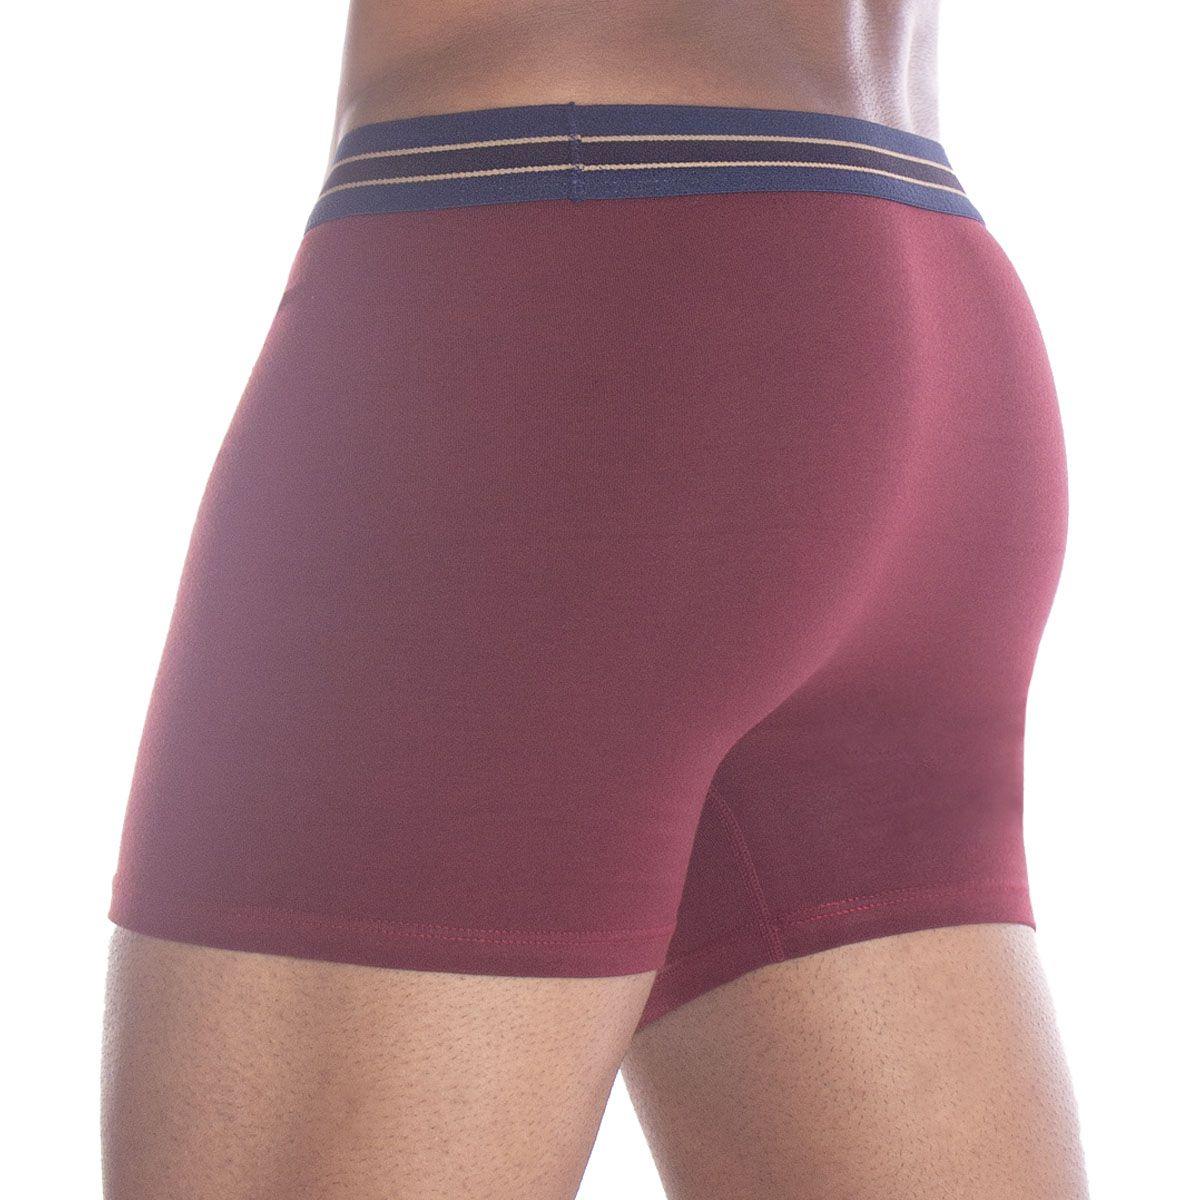 Cueca boxer algodão masculina adulto Lupo -